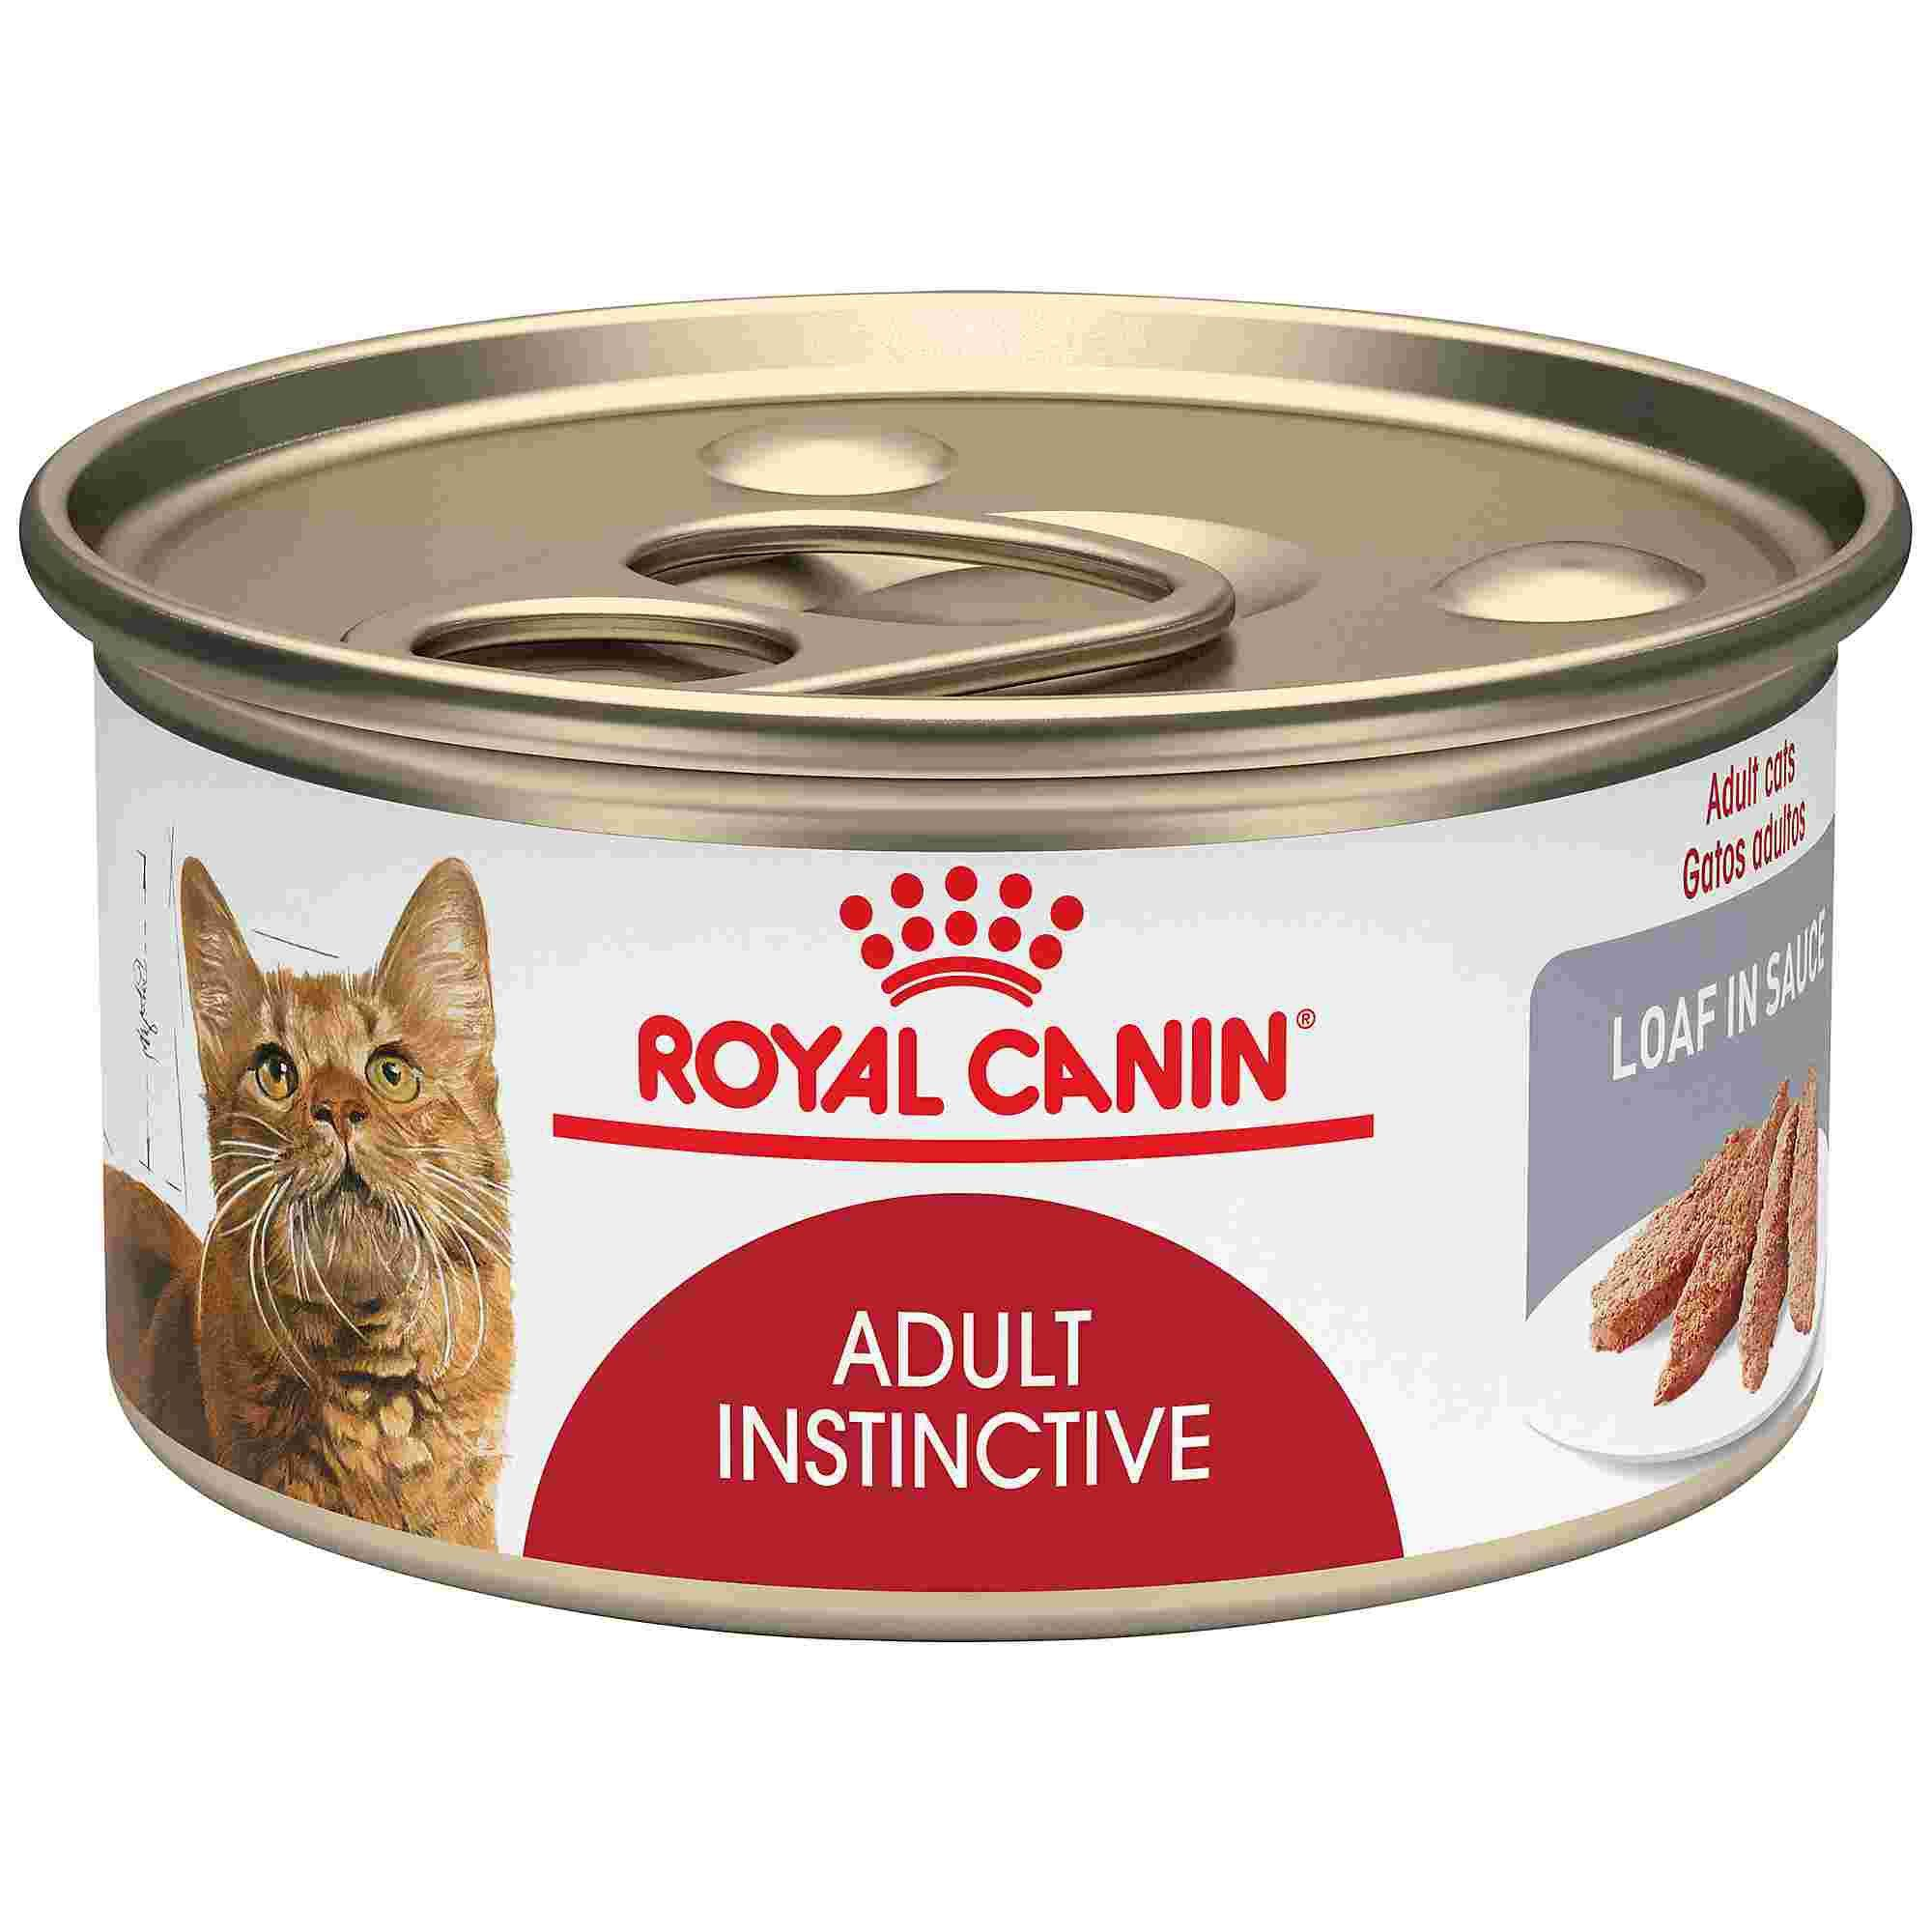 Royal Canin Adult Instinctive Loaf In Sauce Wet Cat Food 5 8 Oz Case Of 24 Canned Cat Food Feline Health Wet Cat Food